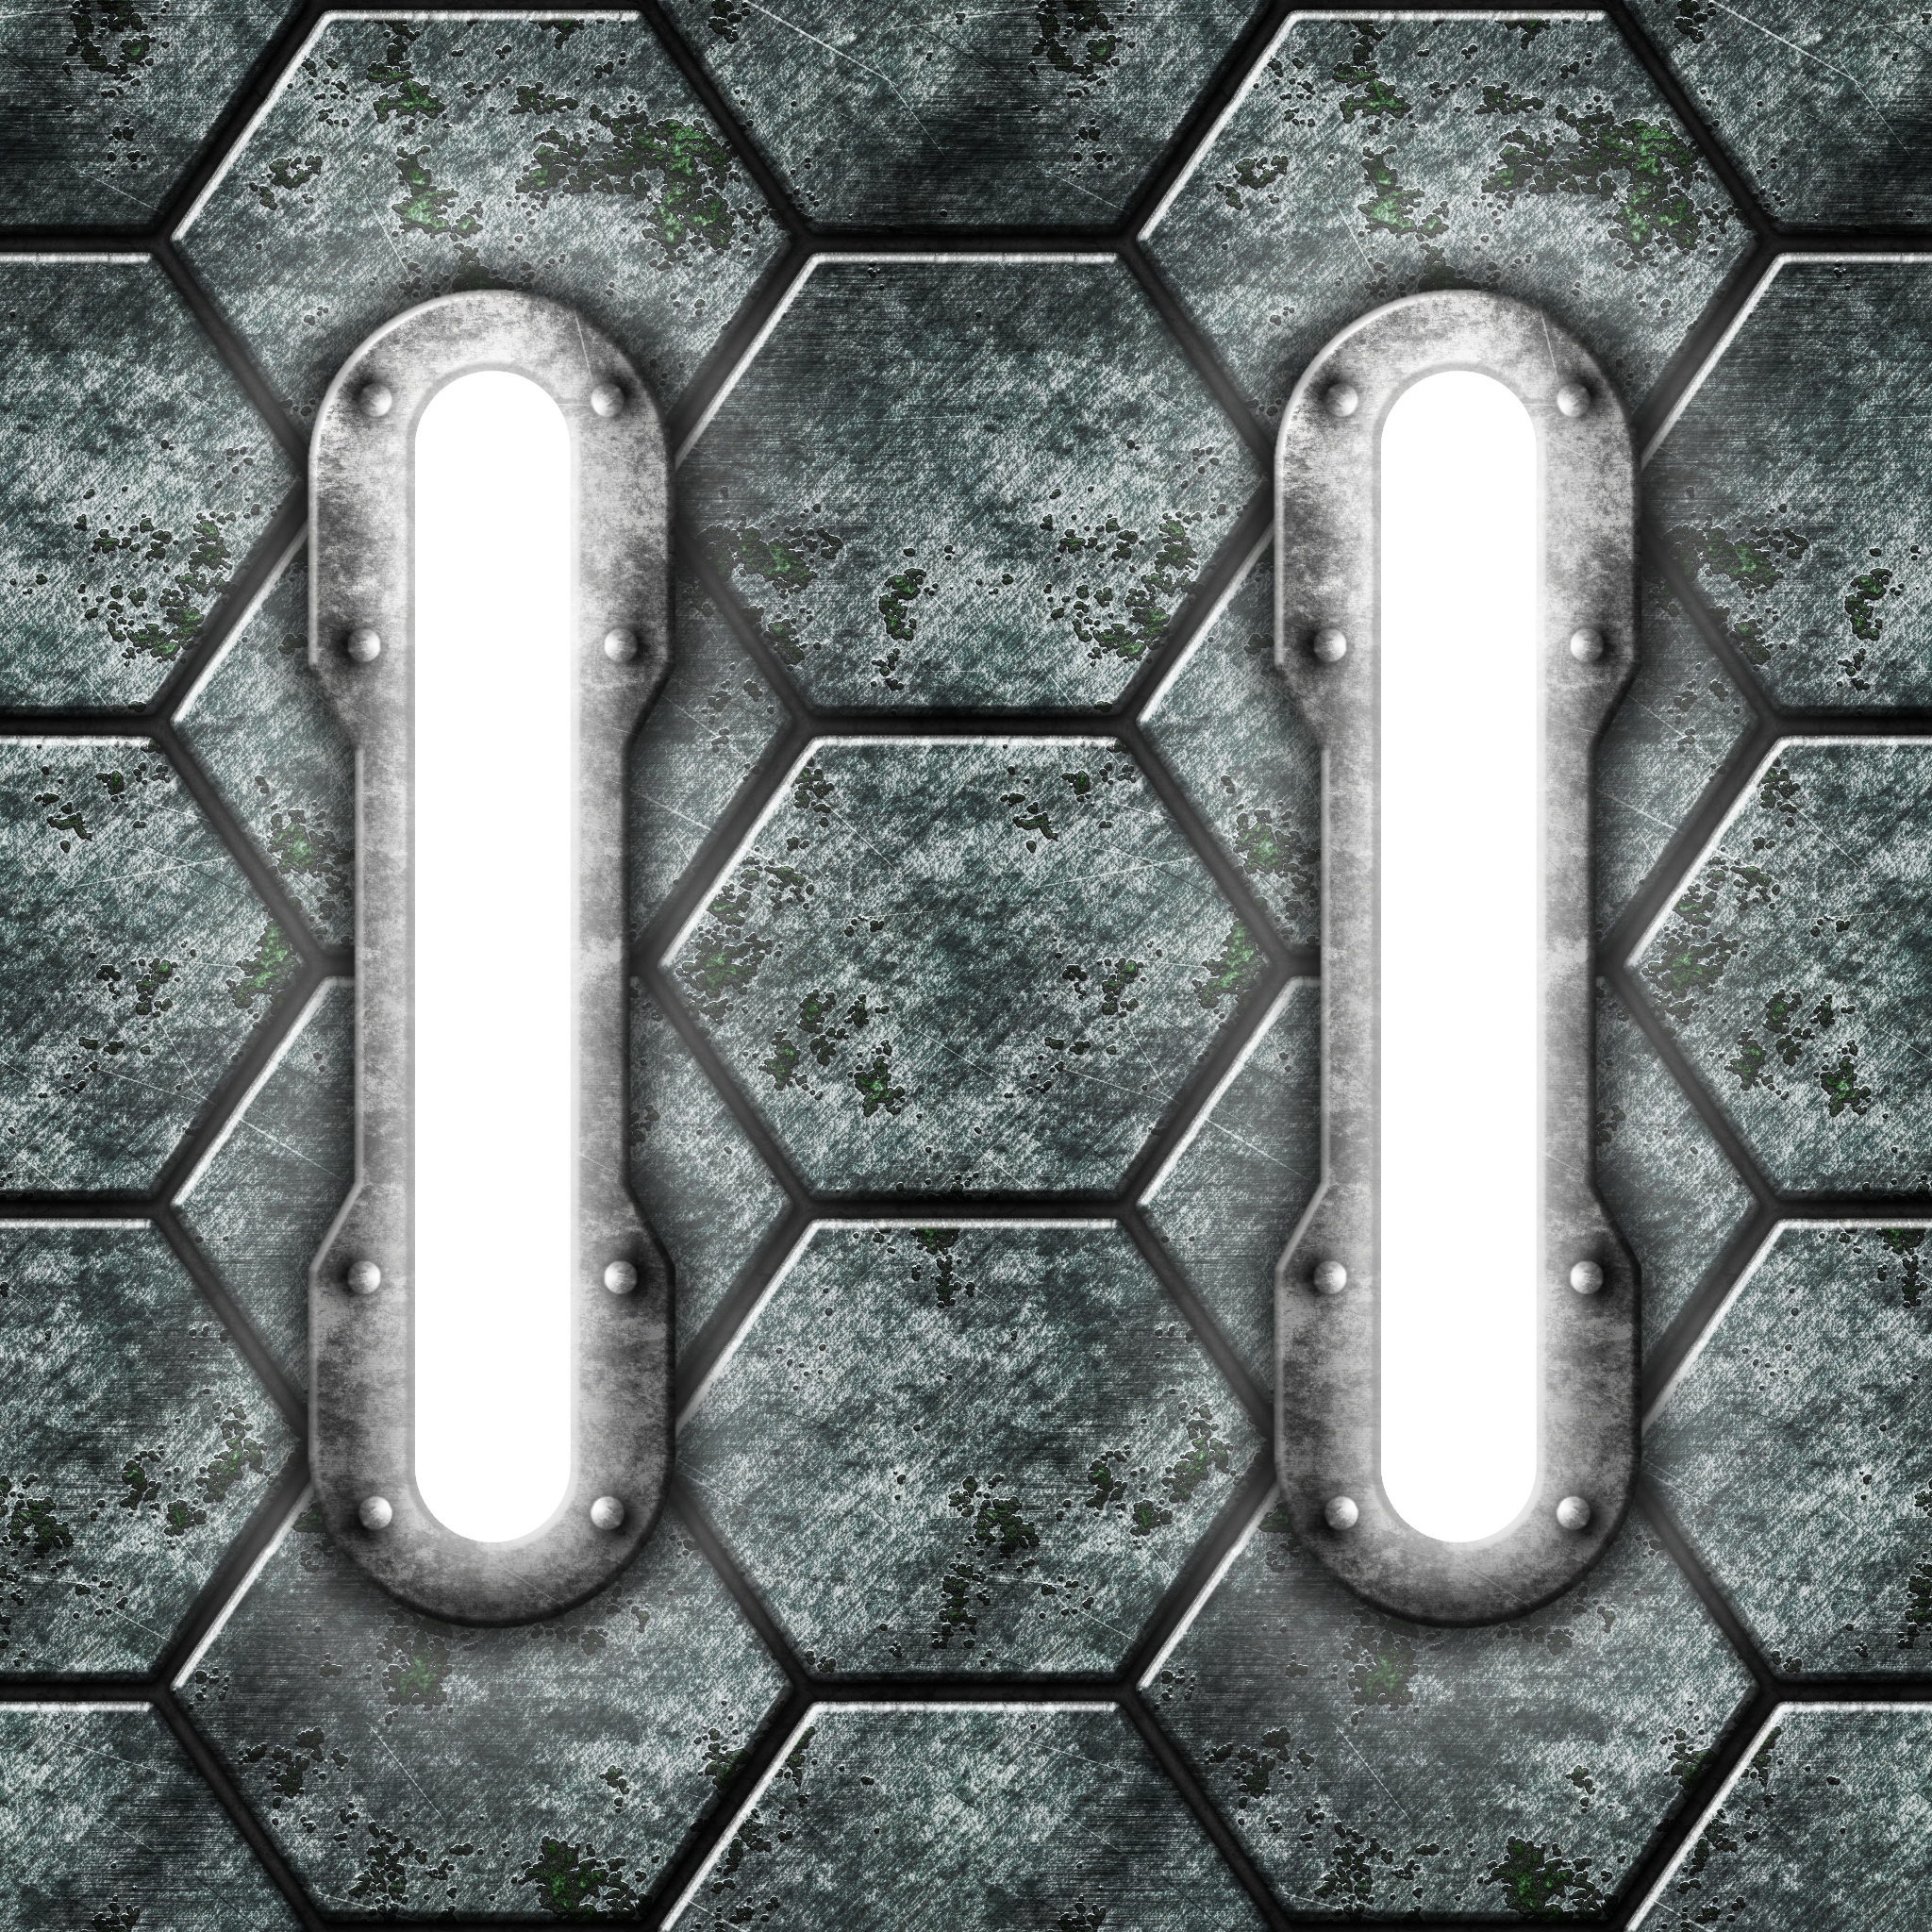 Hexagonal Metal Lights Remake by Hoover1979